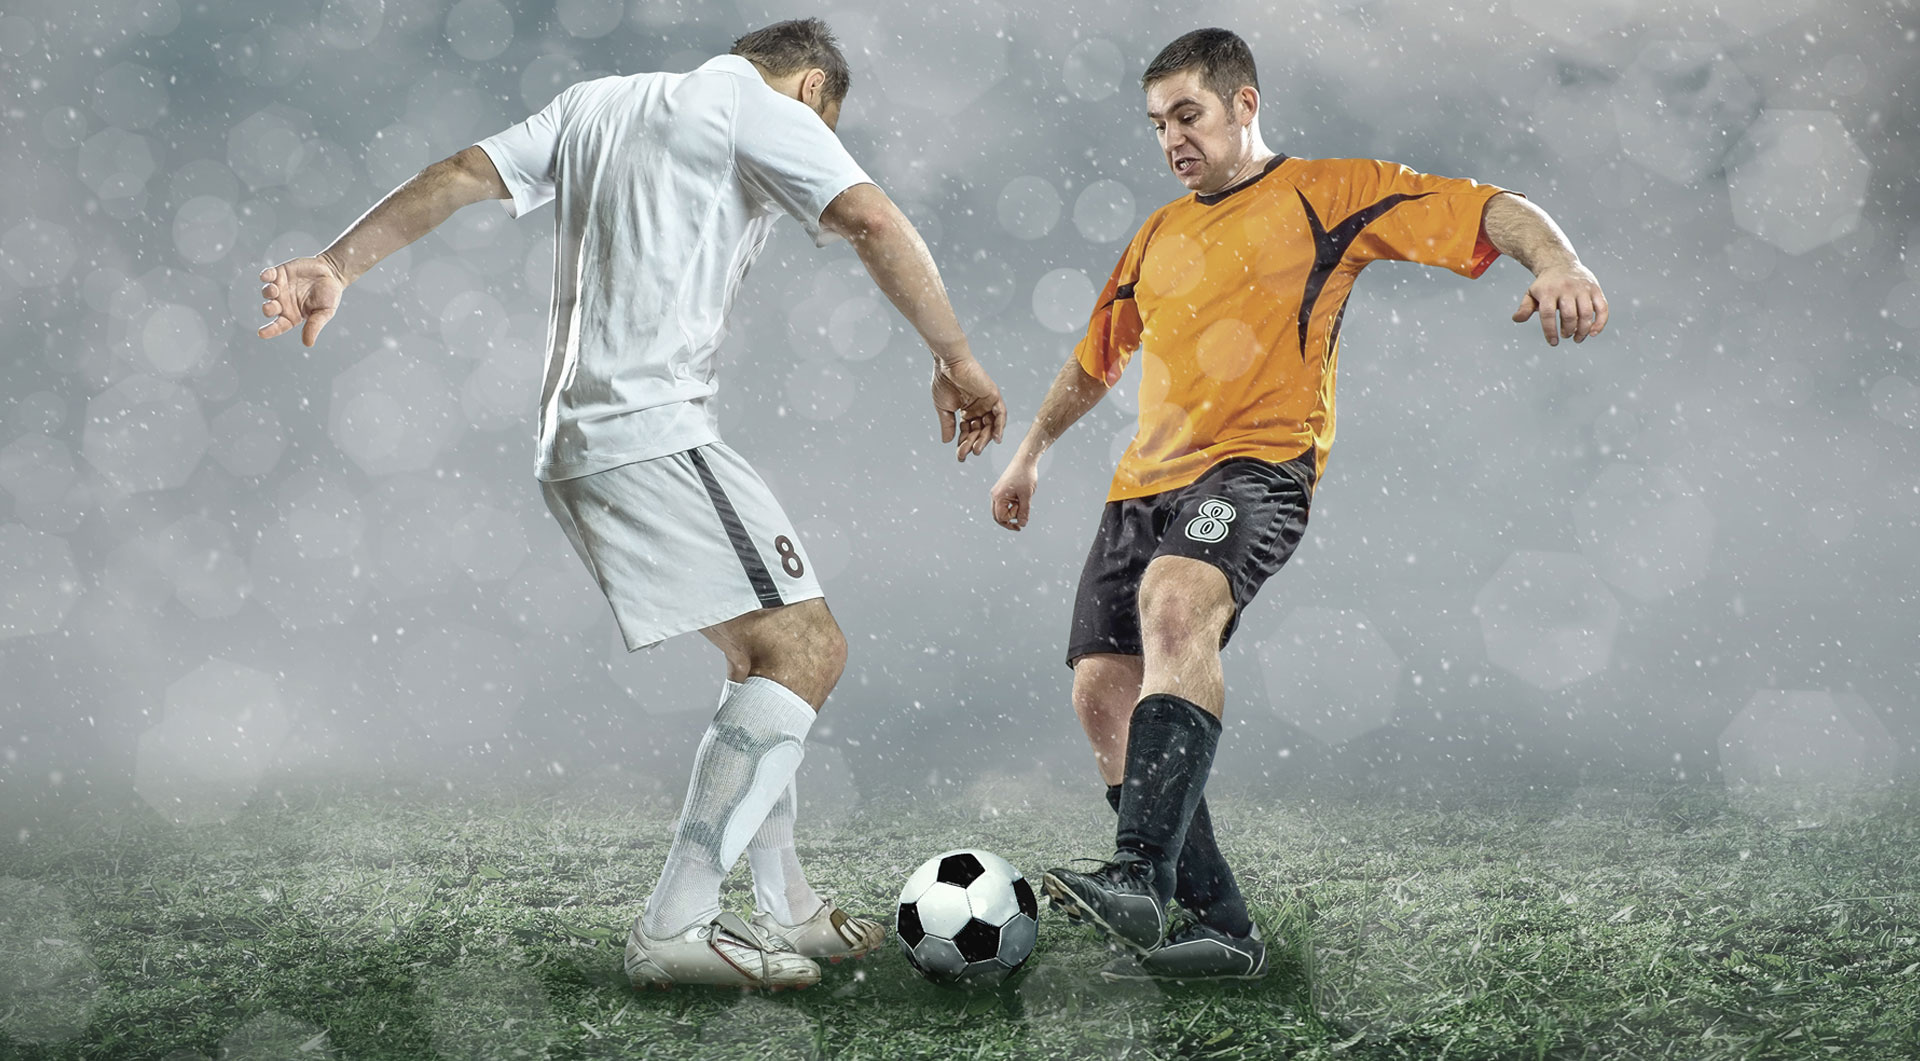 watch-t.-berdych-vs-m.-cilic-online